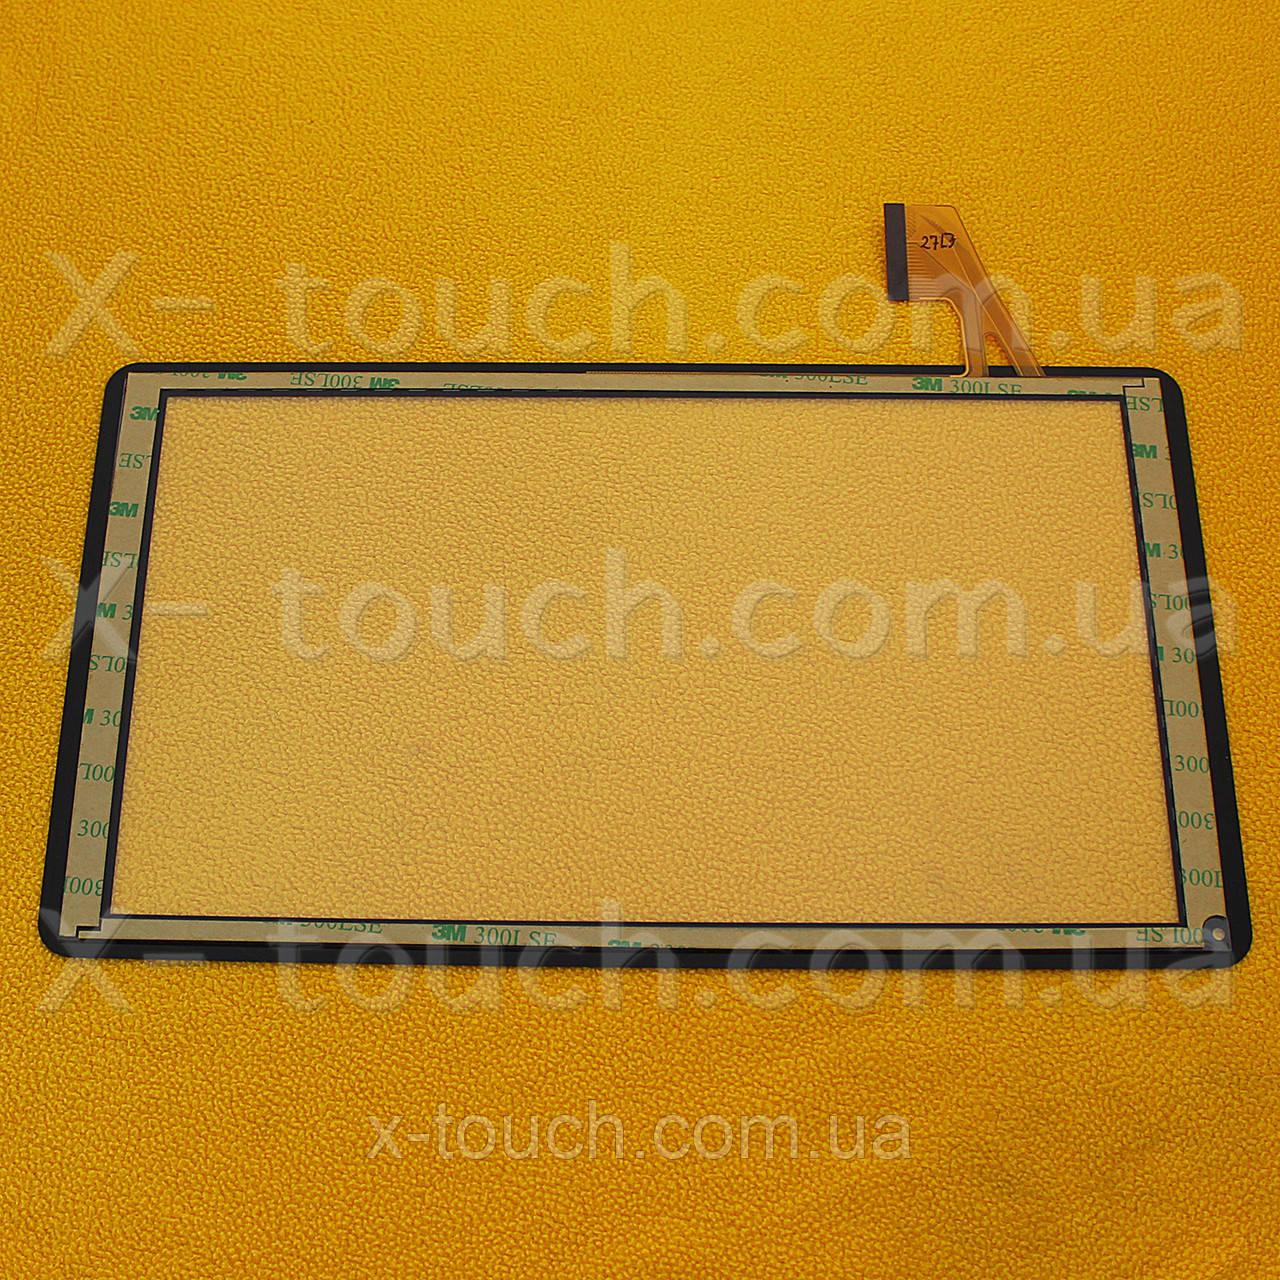 Тачскрин, сенсор RP-365A-10.1-FPC-A3 для планшета